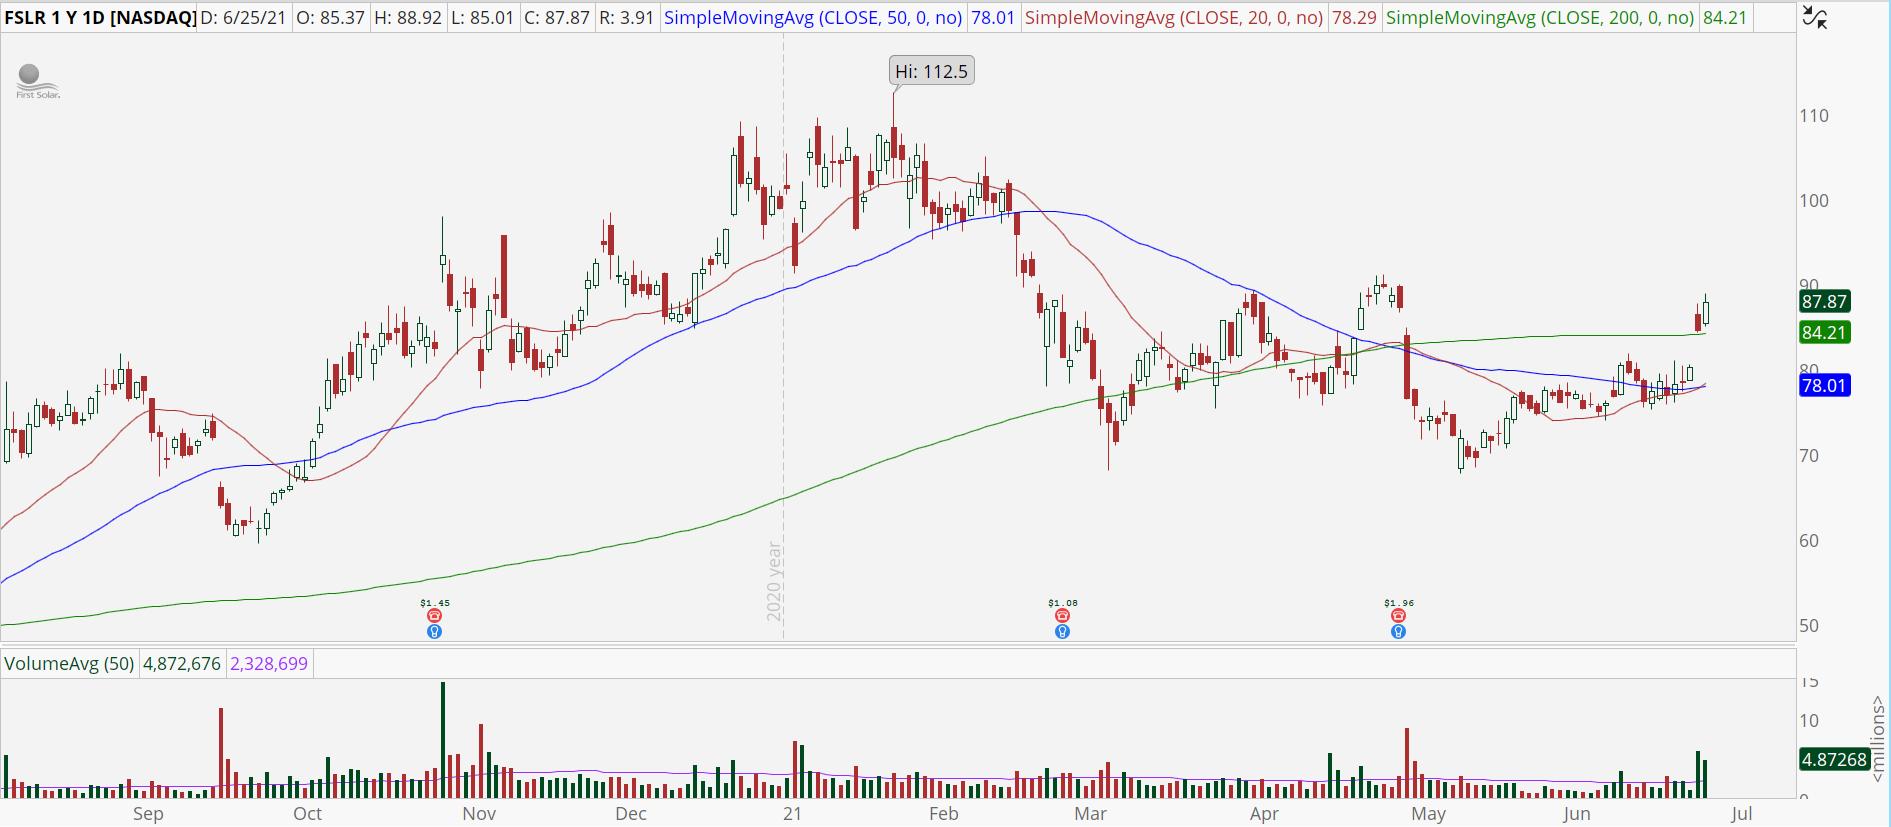 First Solar (FSLR) stock with bullish trend reversal